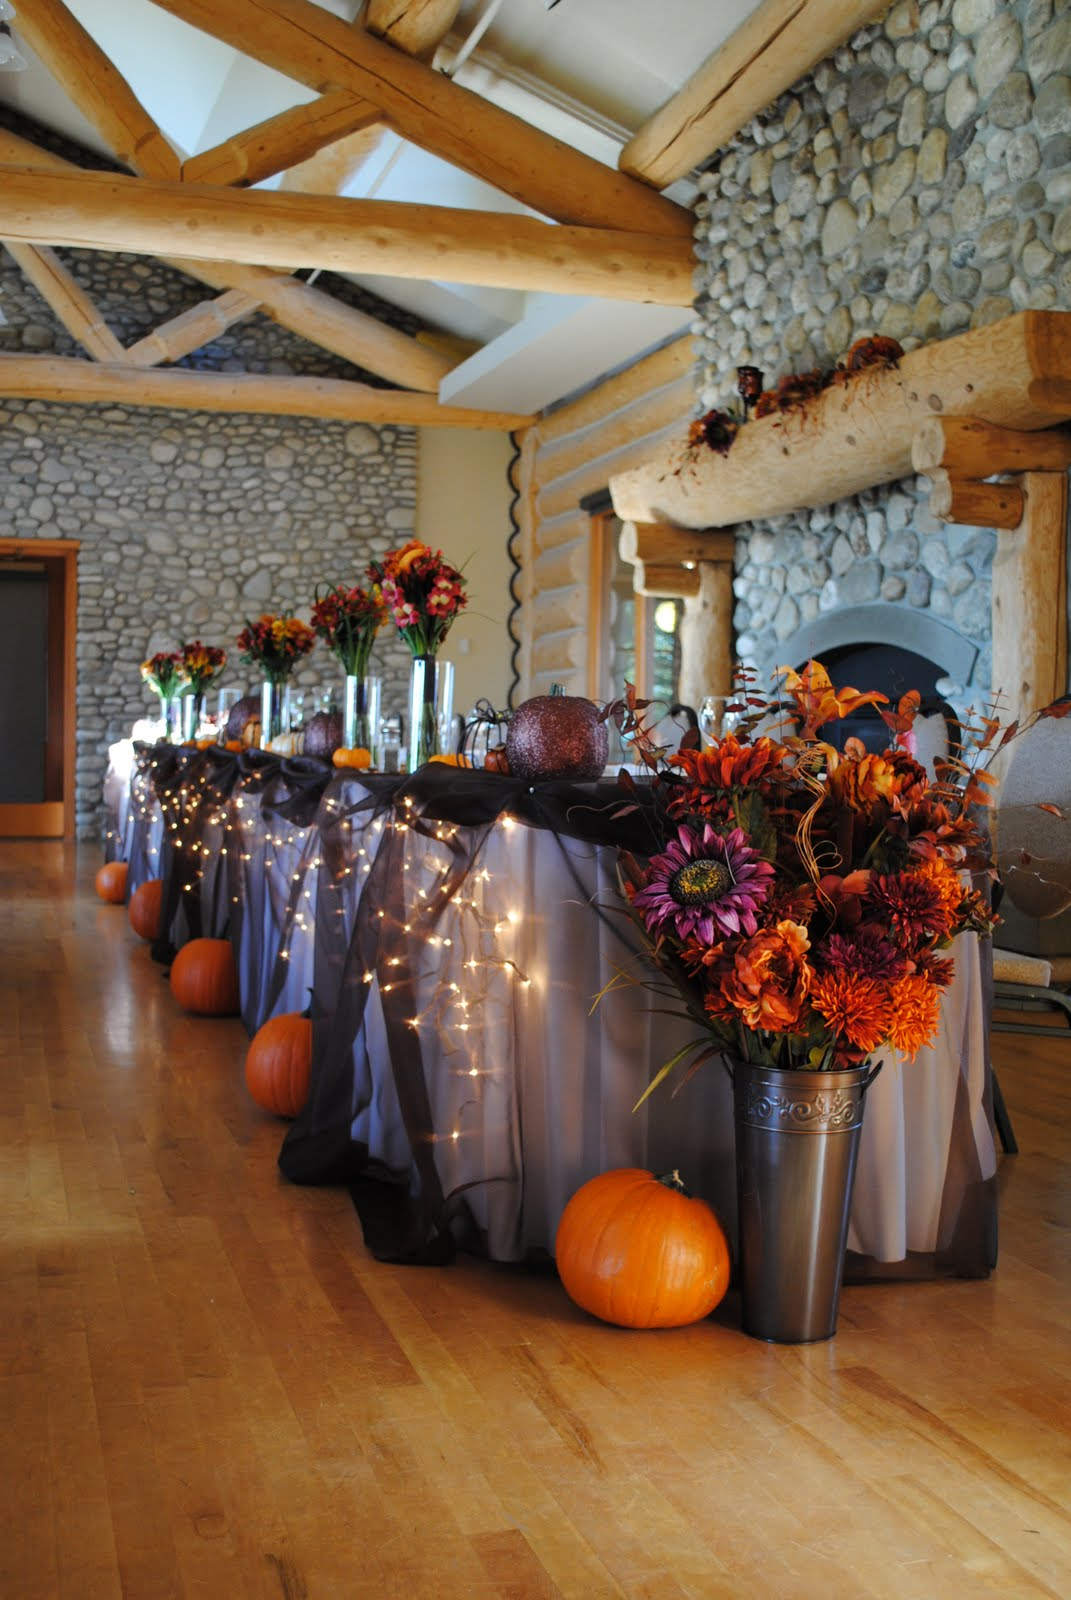 Wishahmon Blog: Pumpkin Themed Wedding